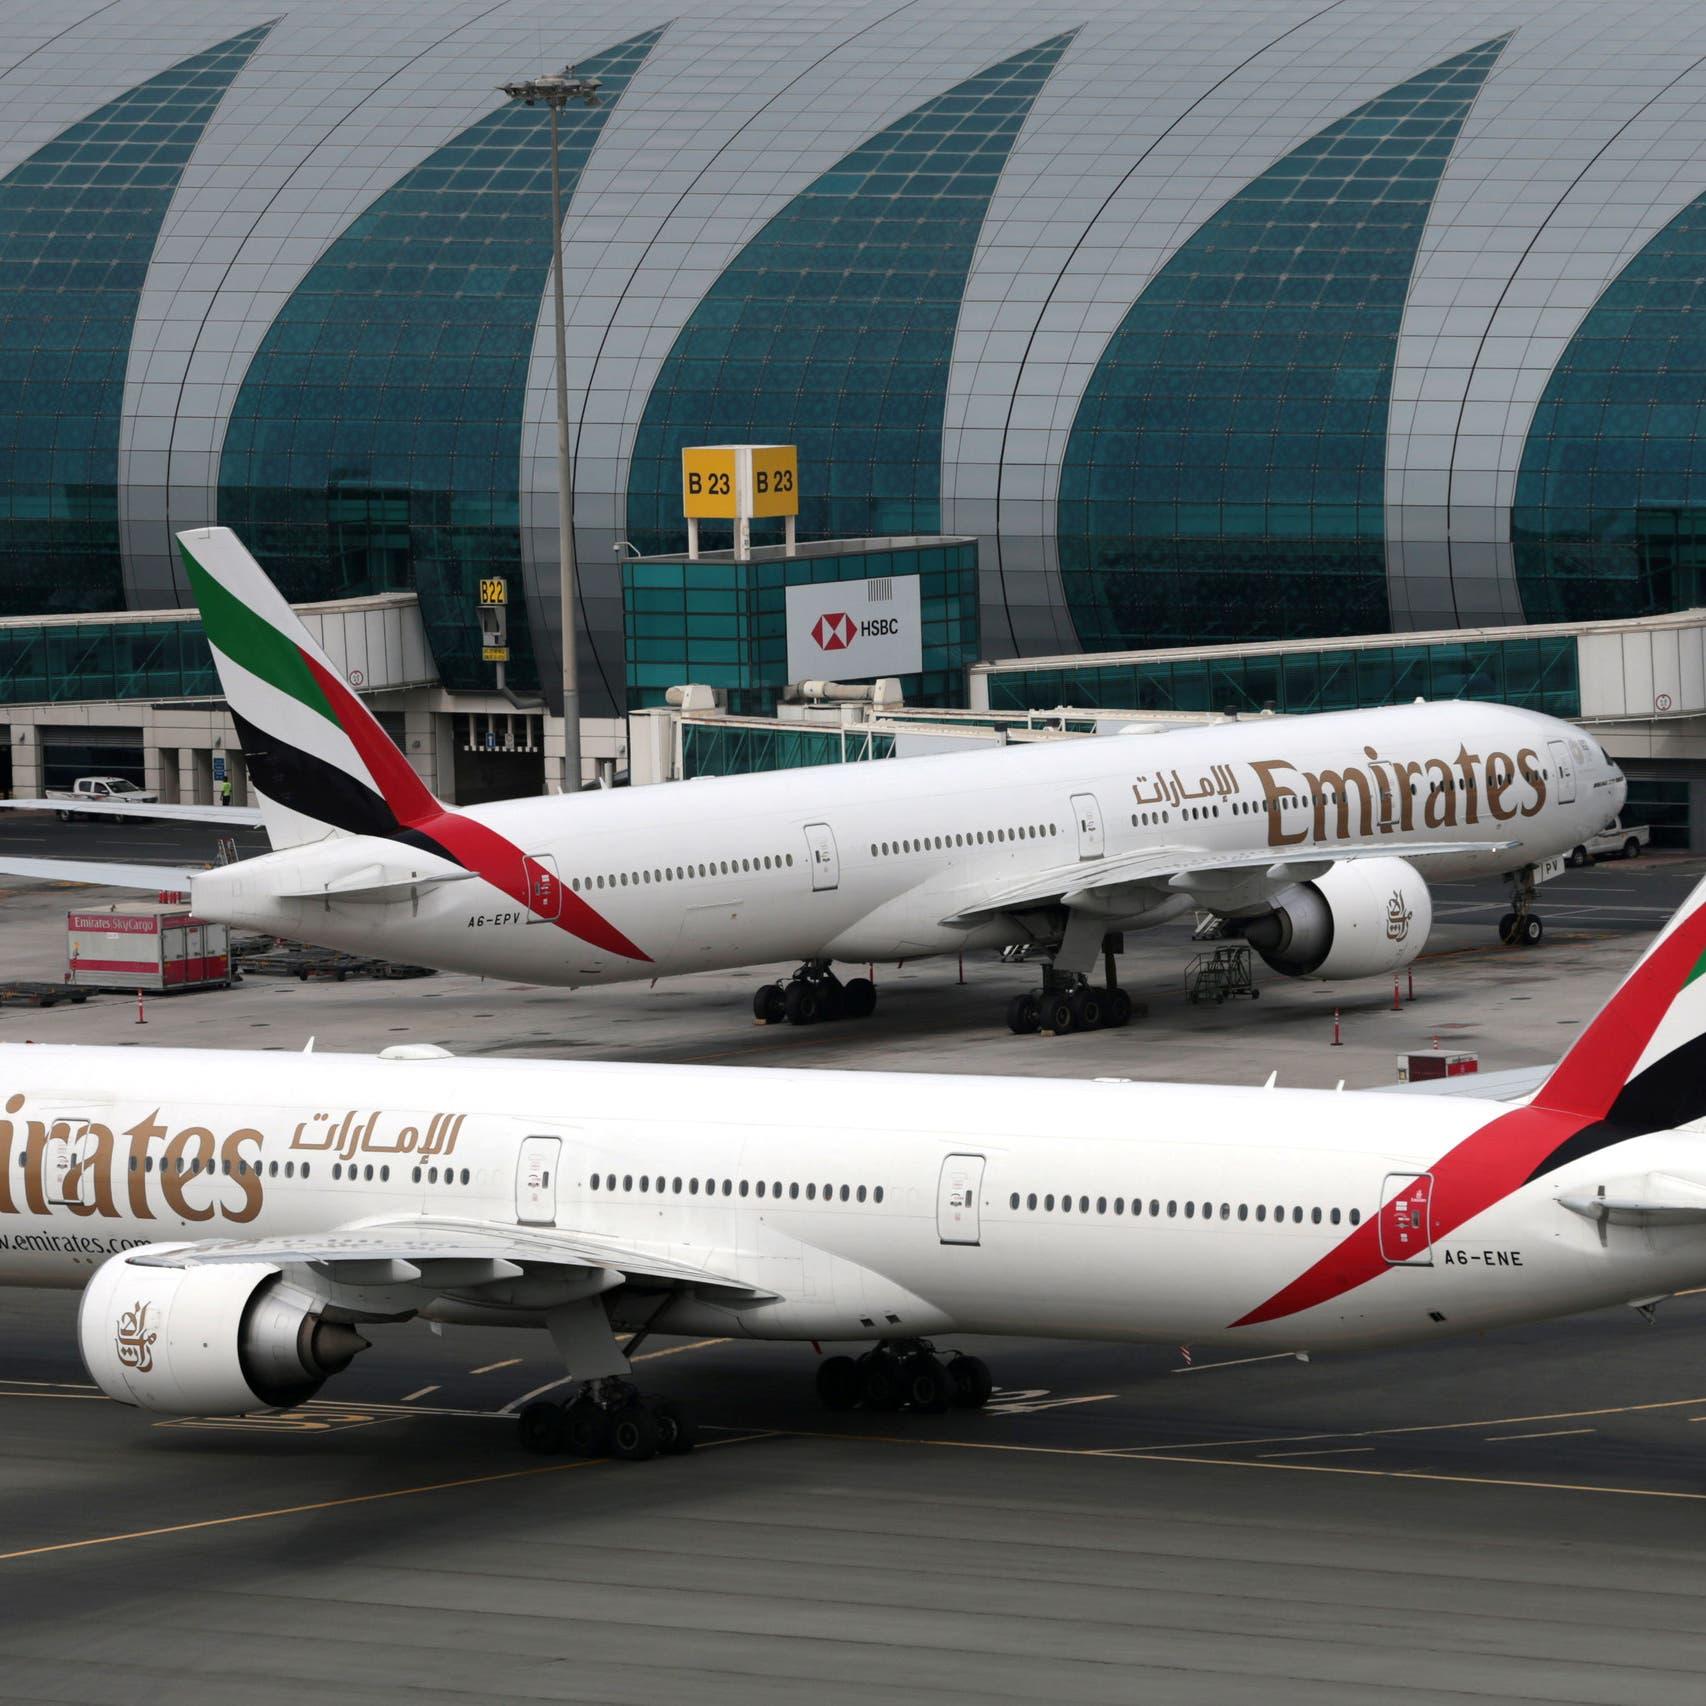 Coronavirus: Emirates says no decision made regarding mass layoffs amid media reports